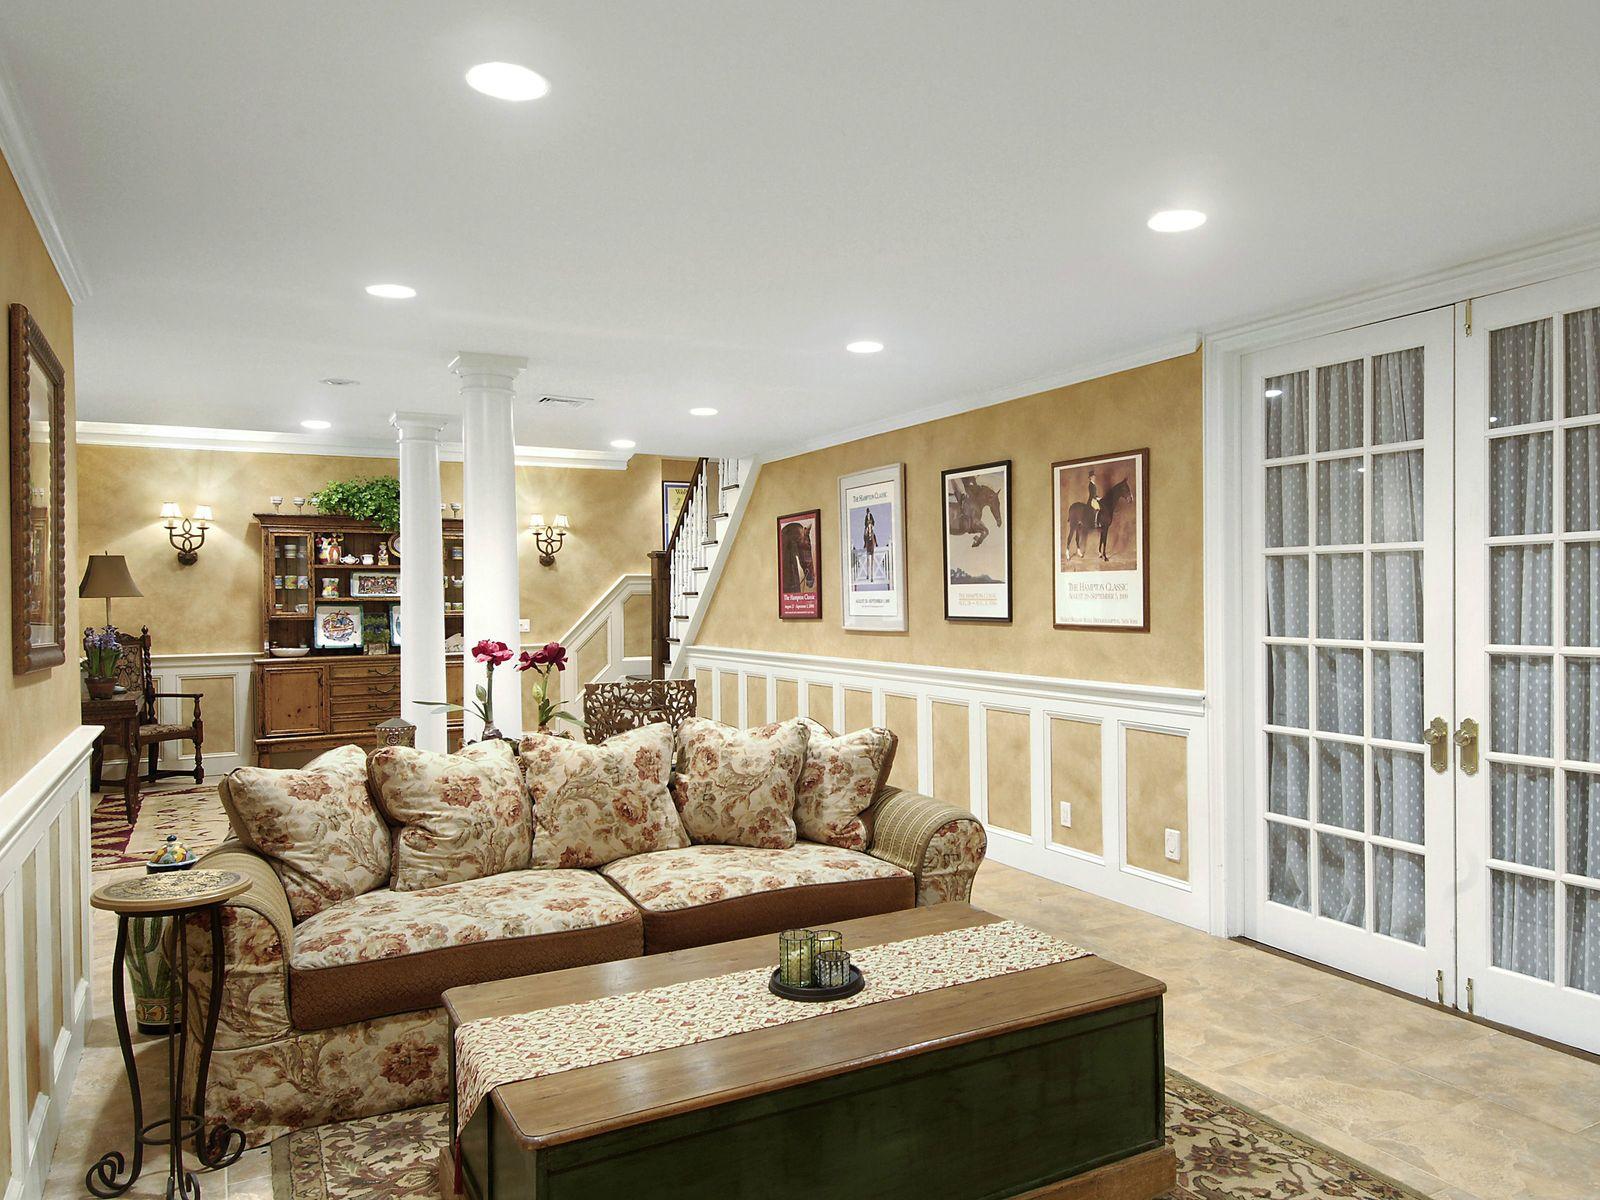 Manor Home, 2.8 +/- Acres Bridgehampton